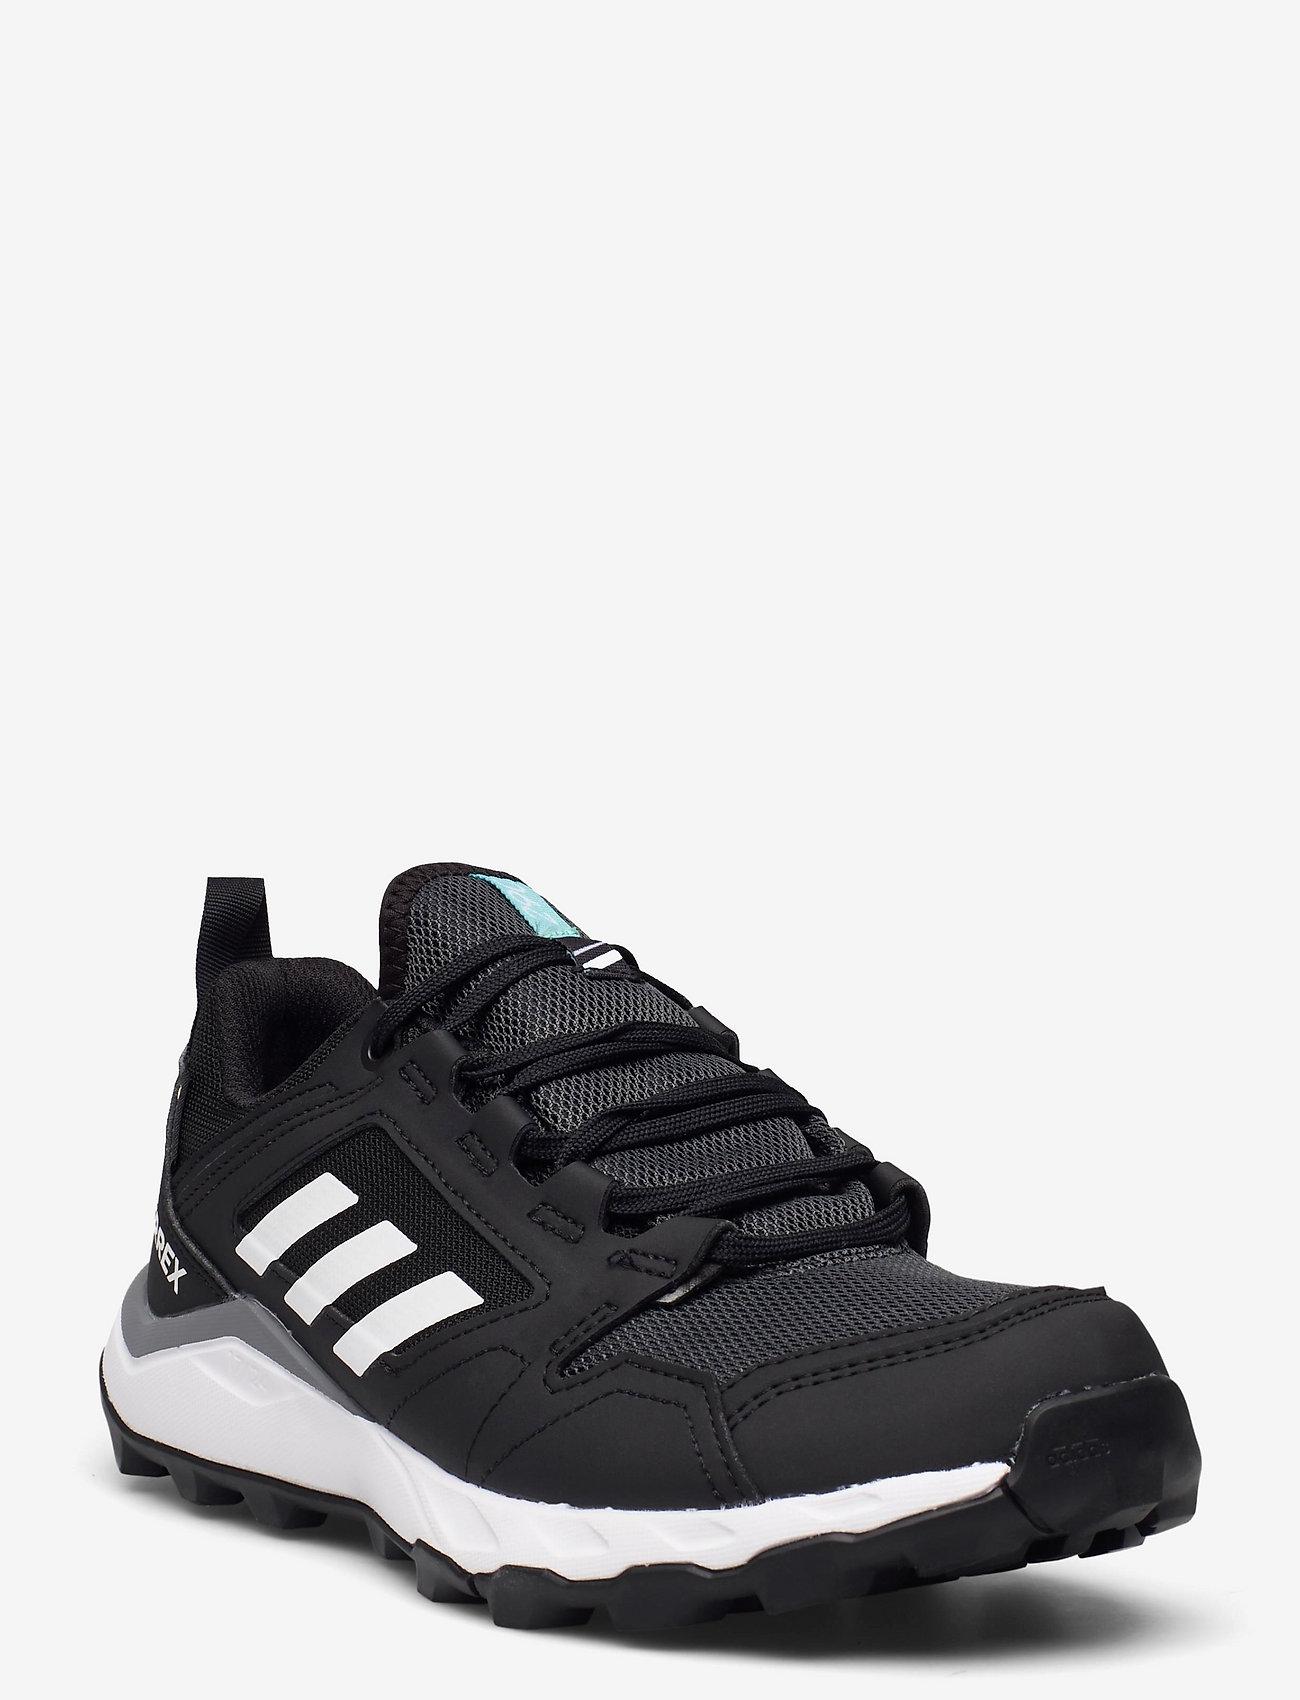 adidas Performance - Terrex Agravic TR GORE-TEX Trail Running  W - running shoes - cblack/crywht/acimin - 0